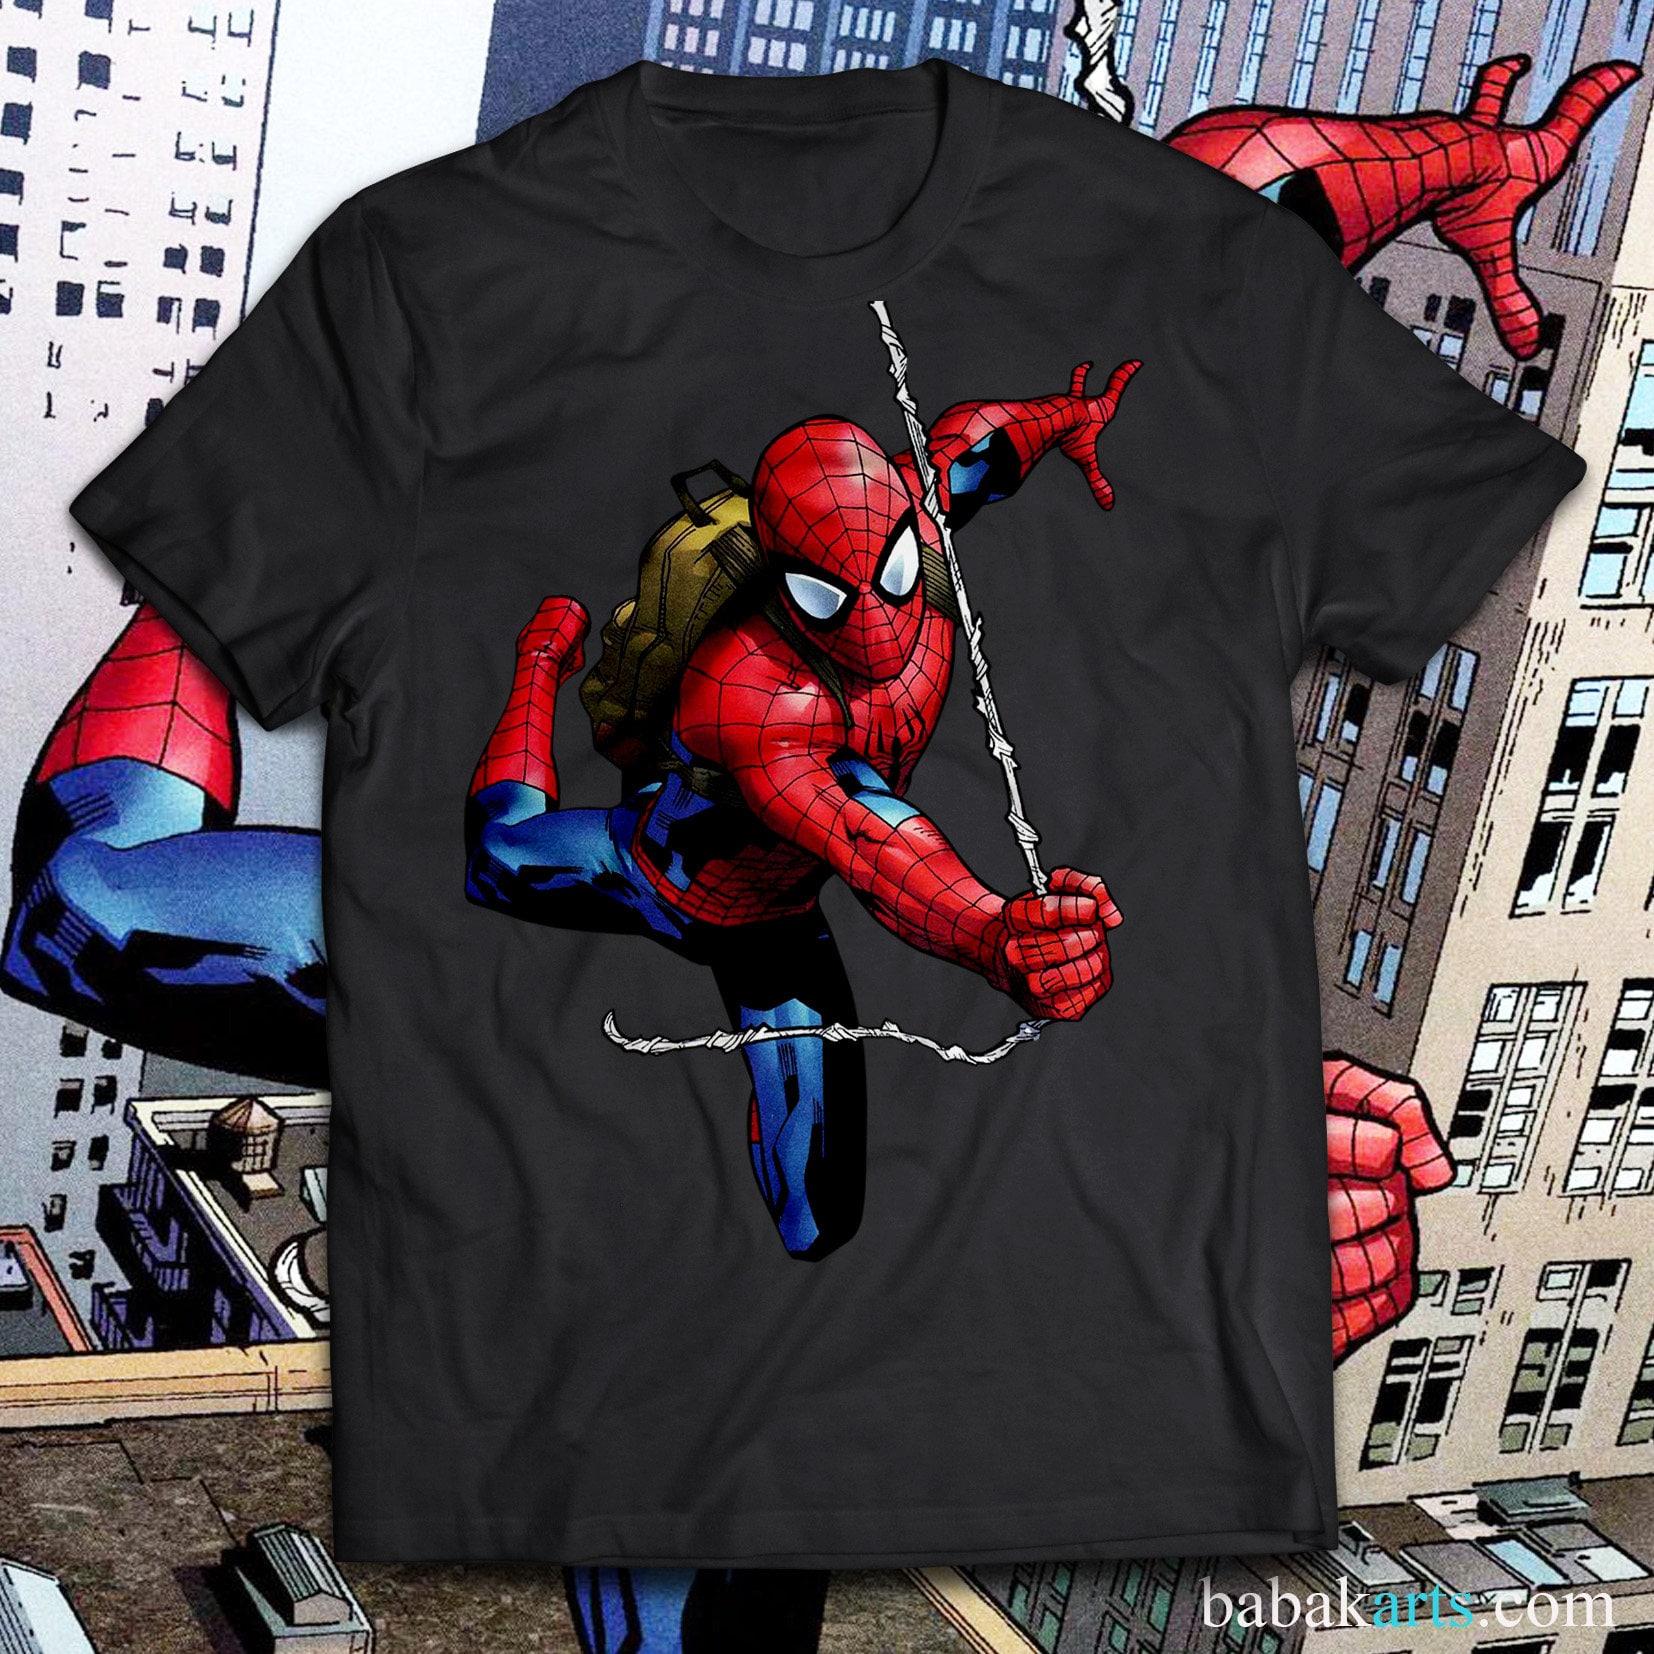 faf0a281d Spider-Man T-Shirt Spiderman Shirt Gift for Men Women & Kids   Etsy